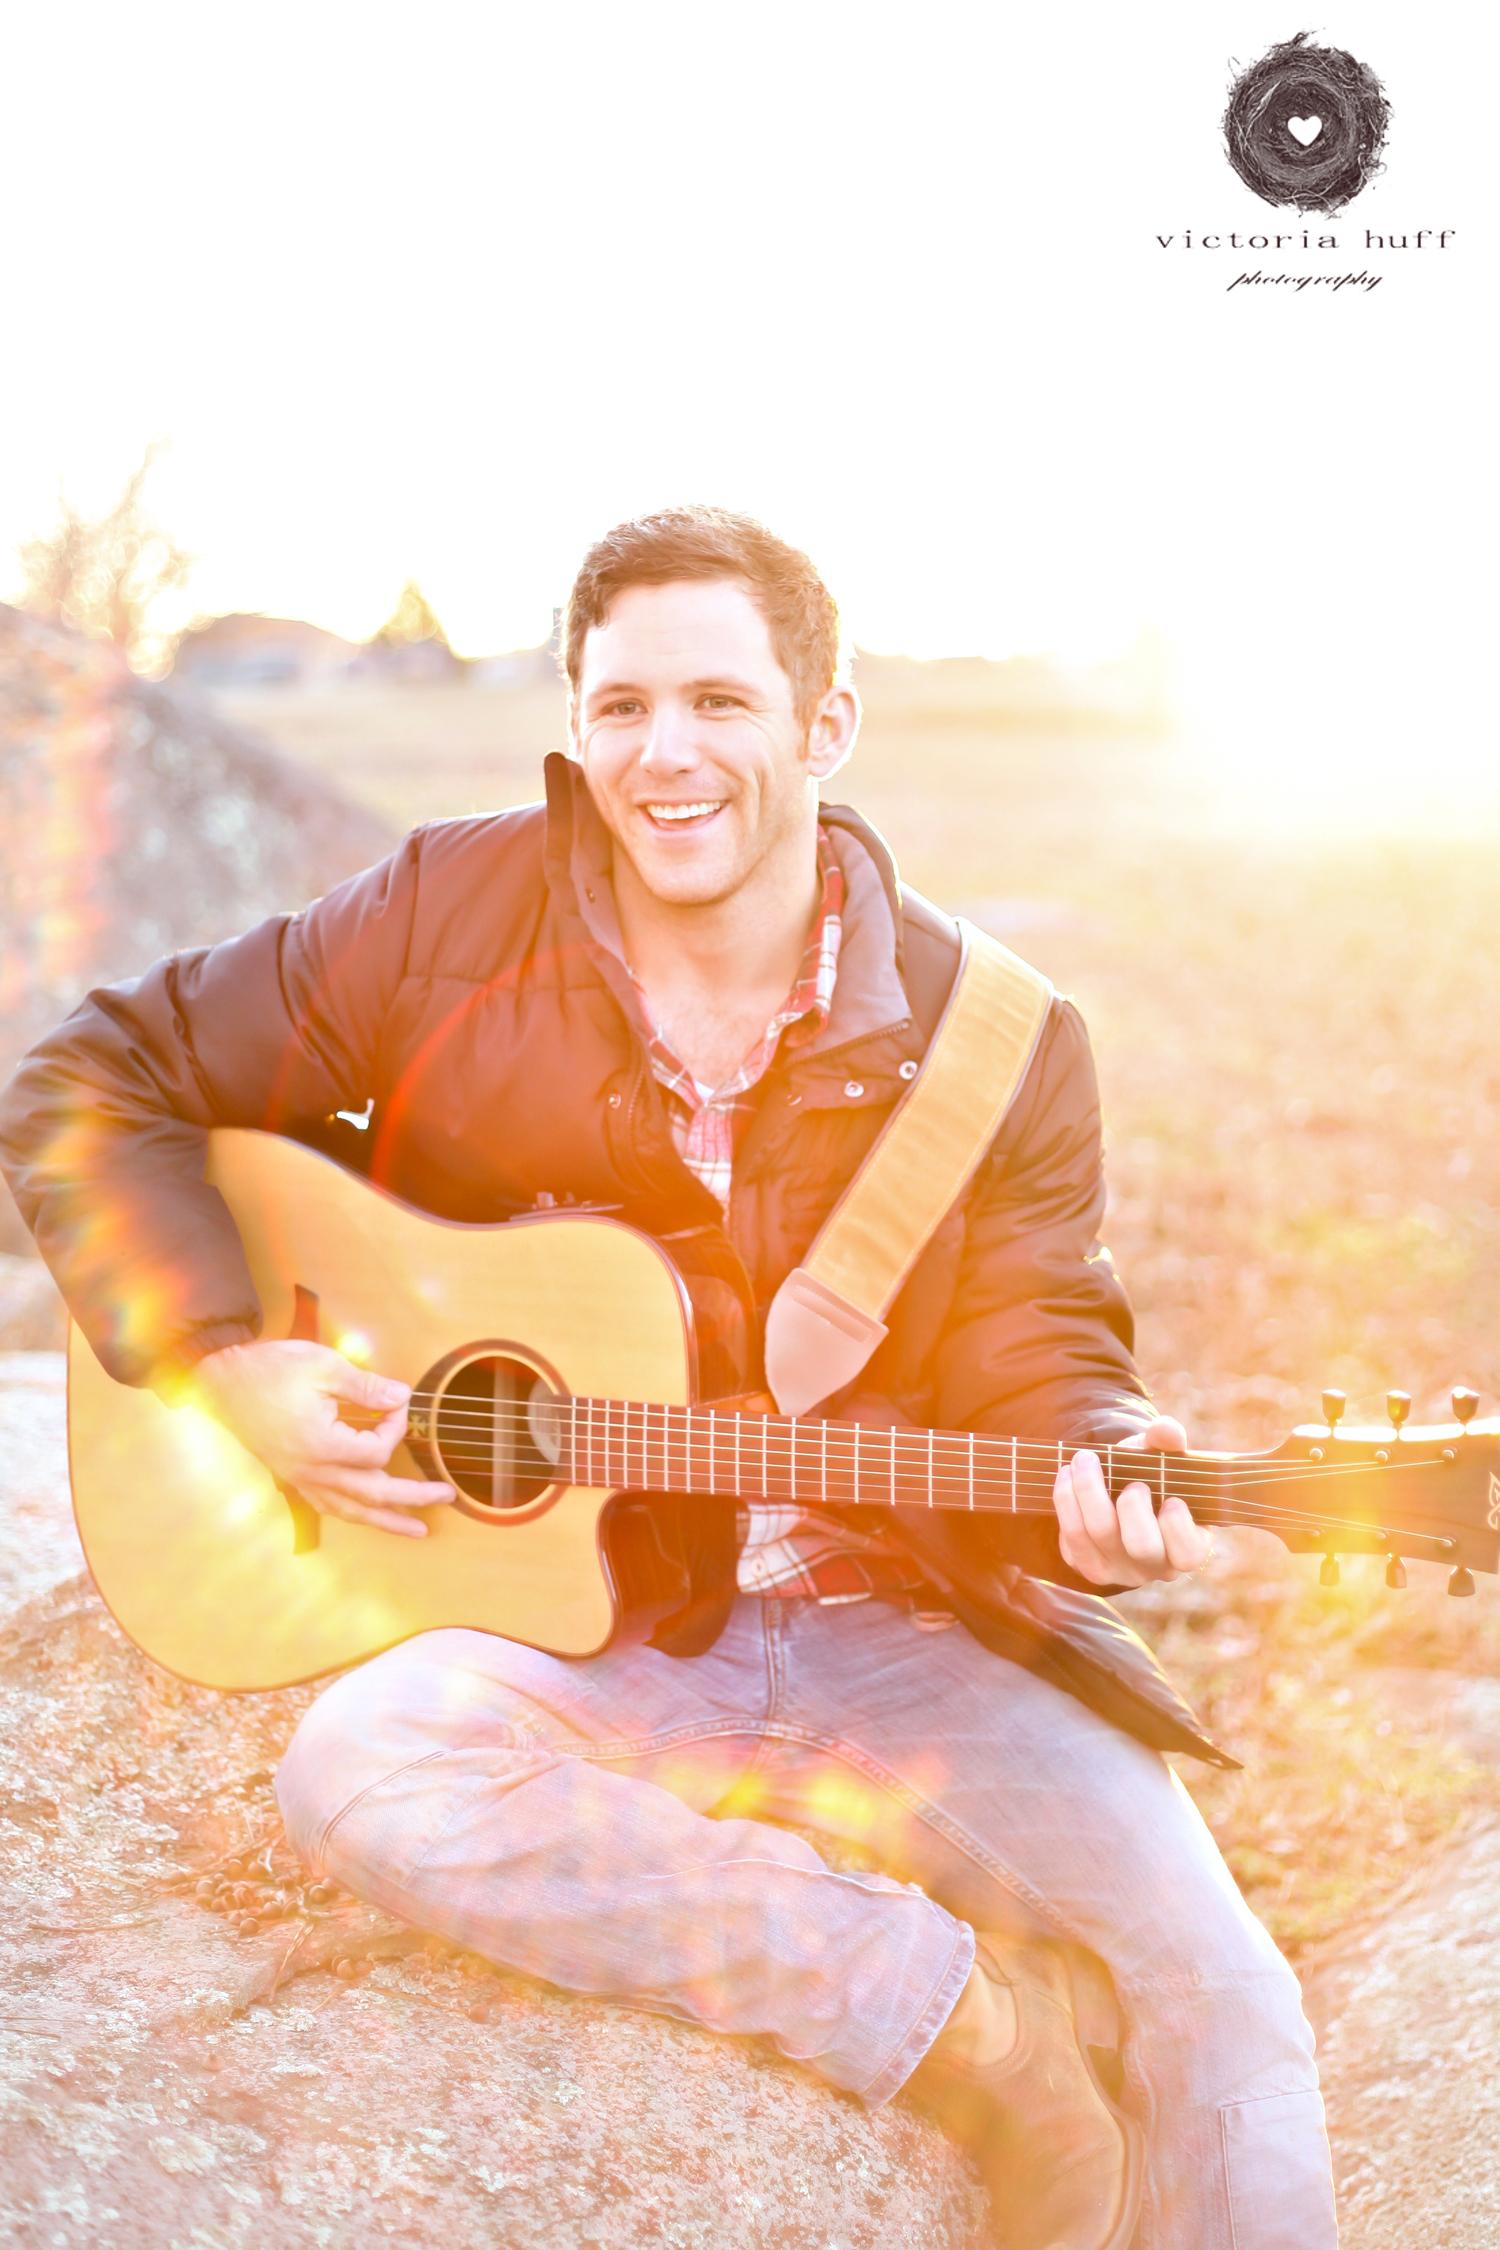 Matt-Lavender-Country-Guitar-Athens-Georgia-Music-sunrise-Photography.jpg